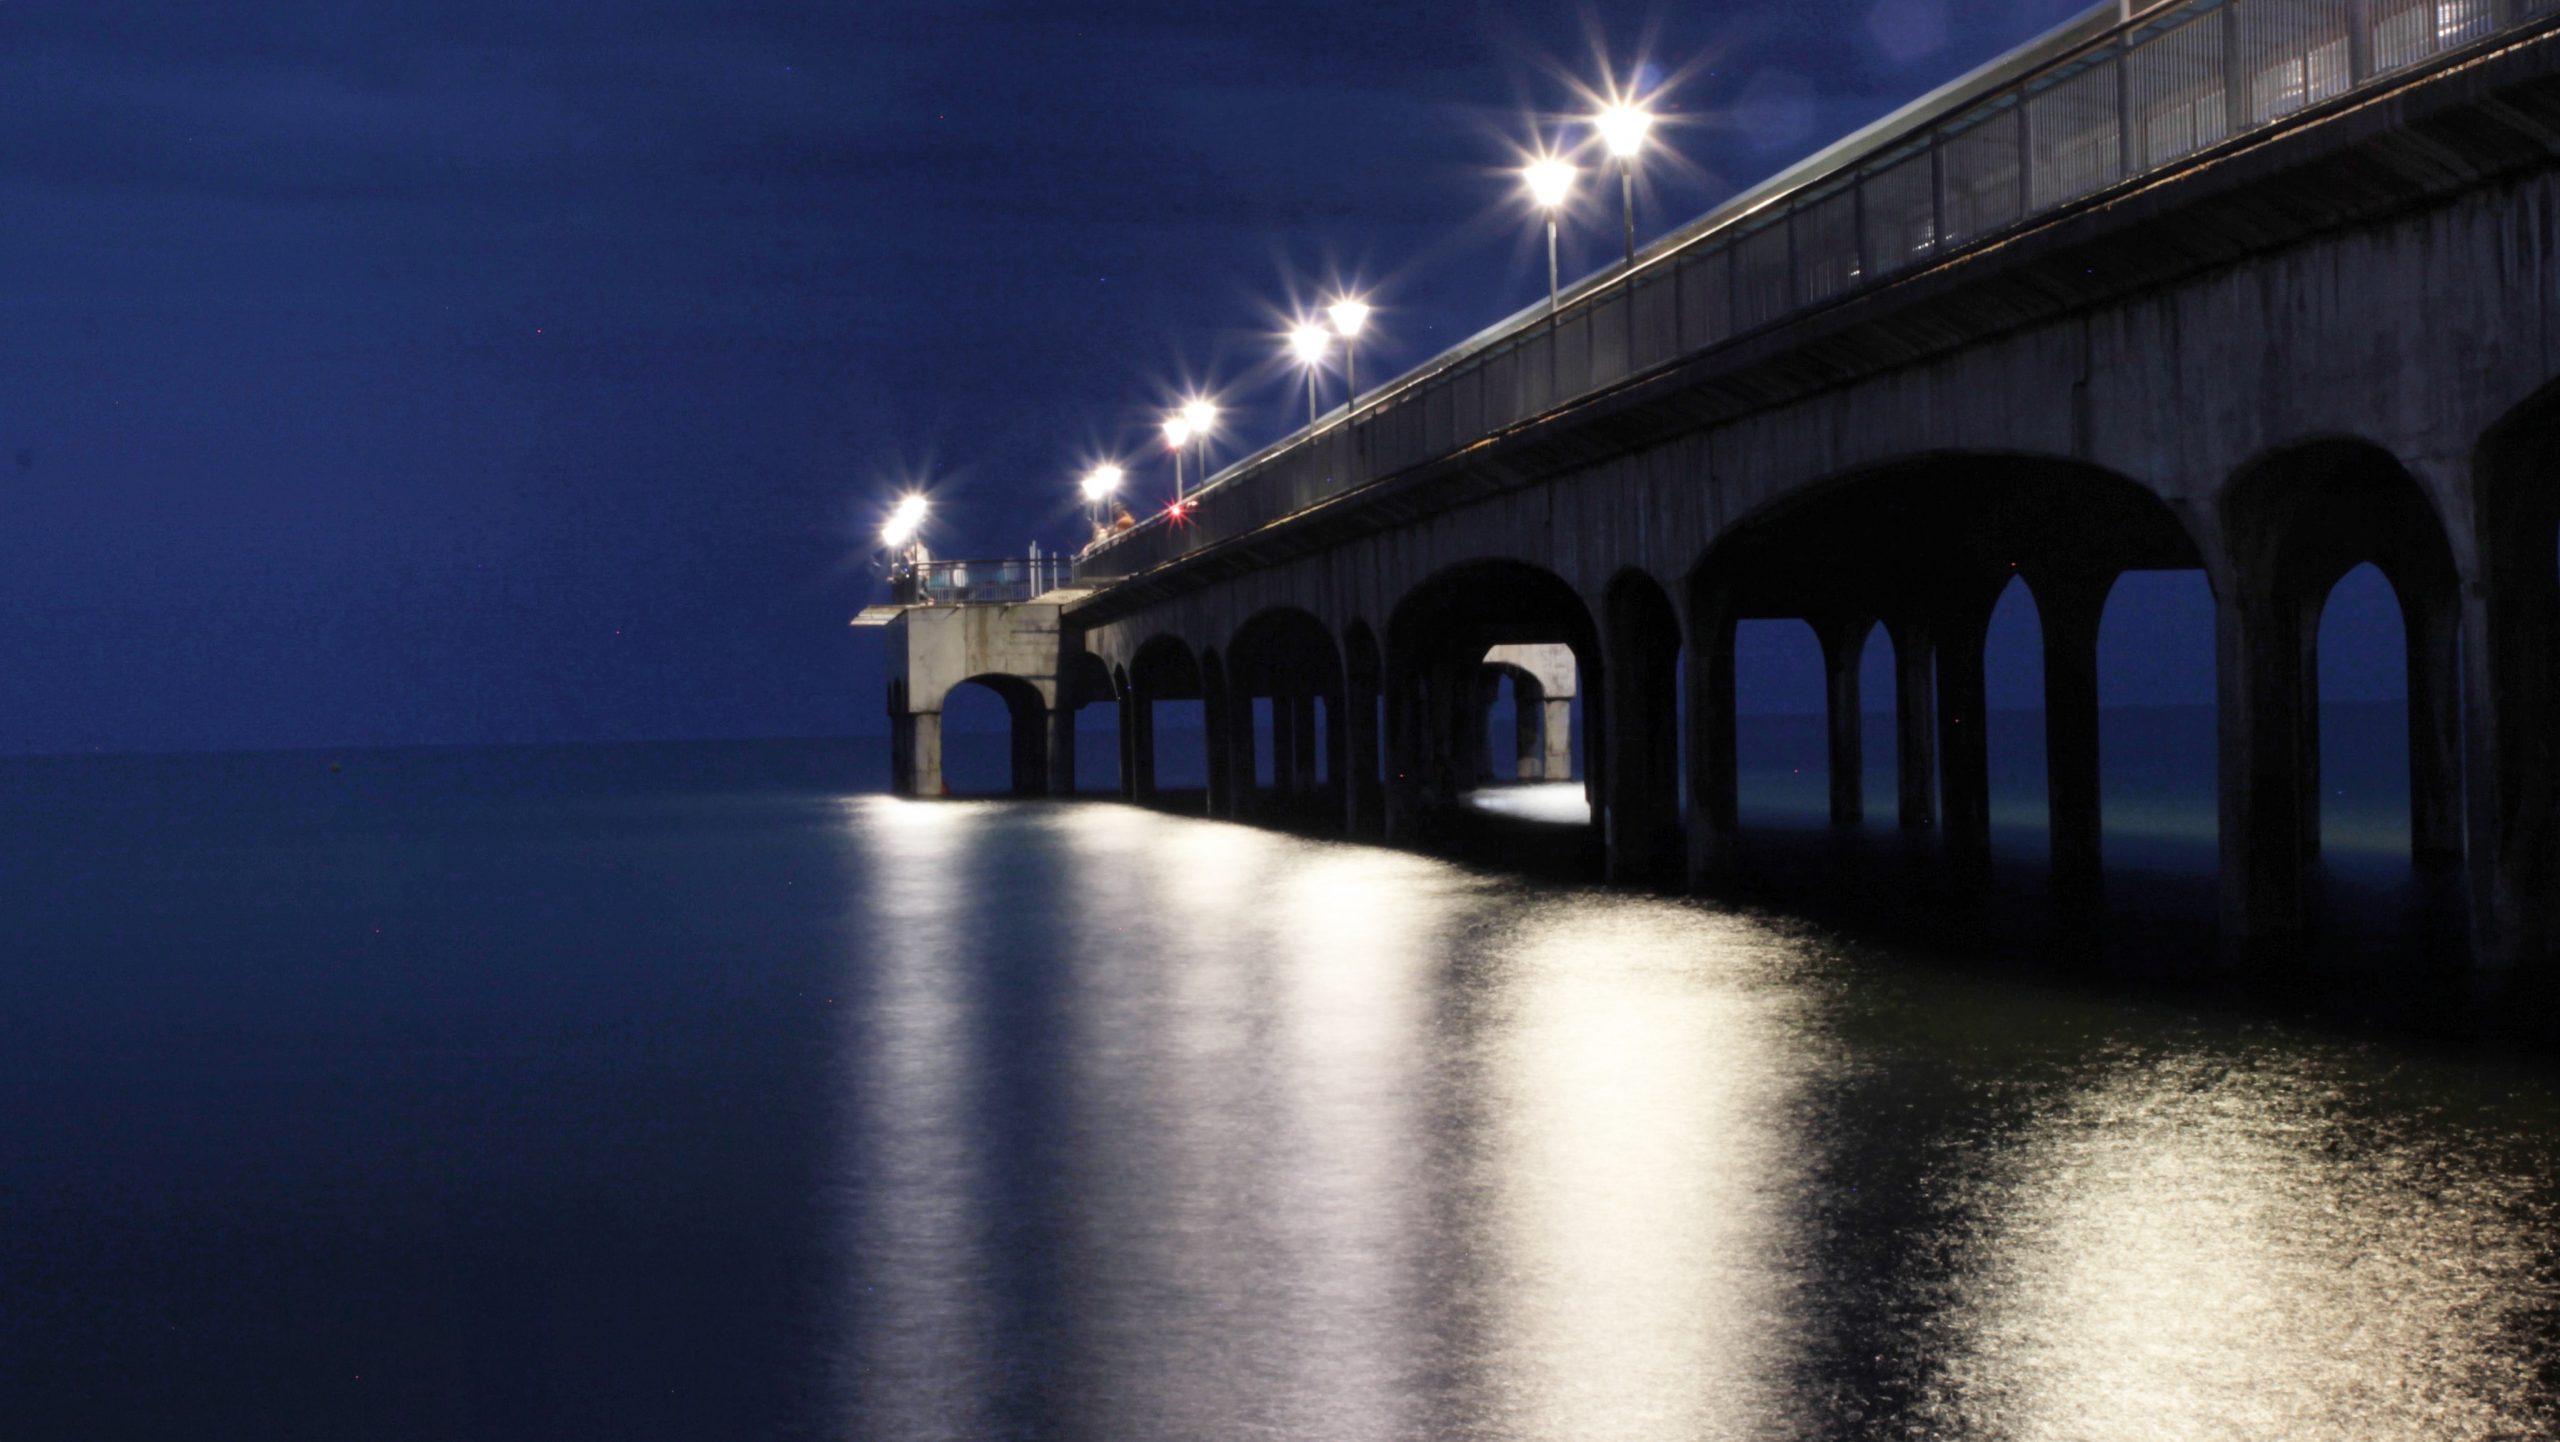 Boscombe pier night reflected lights